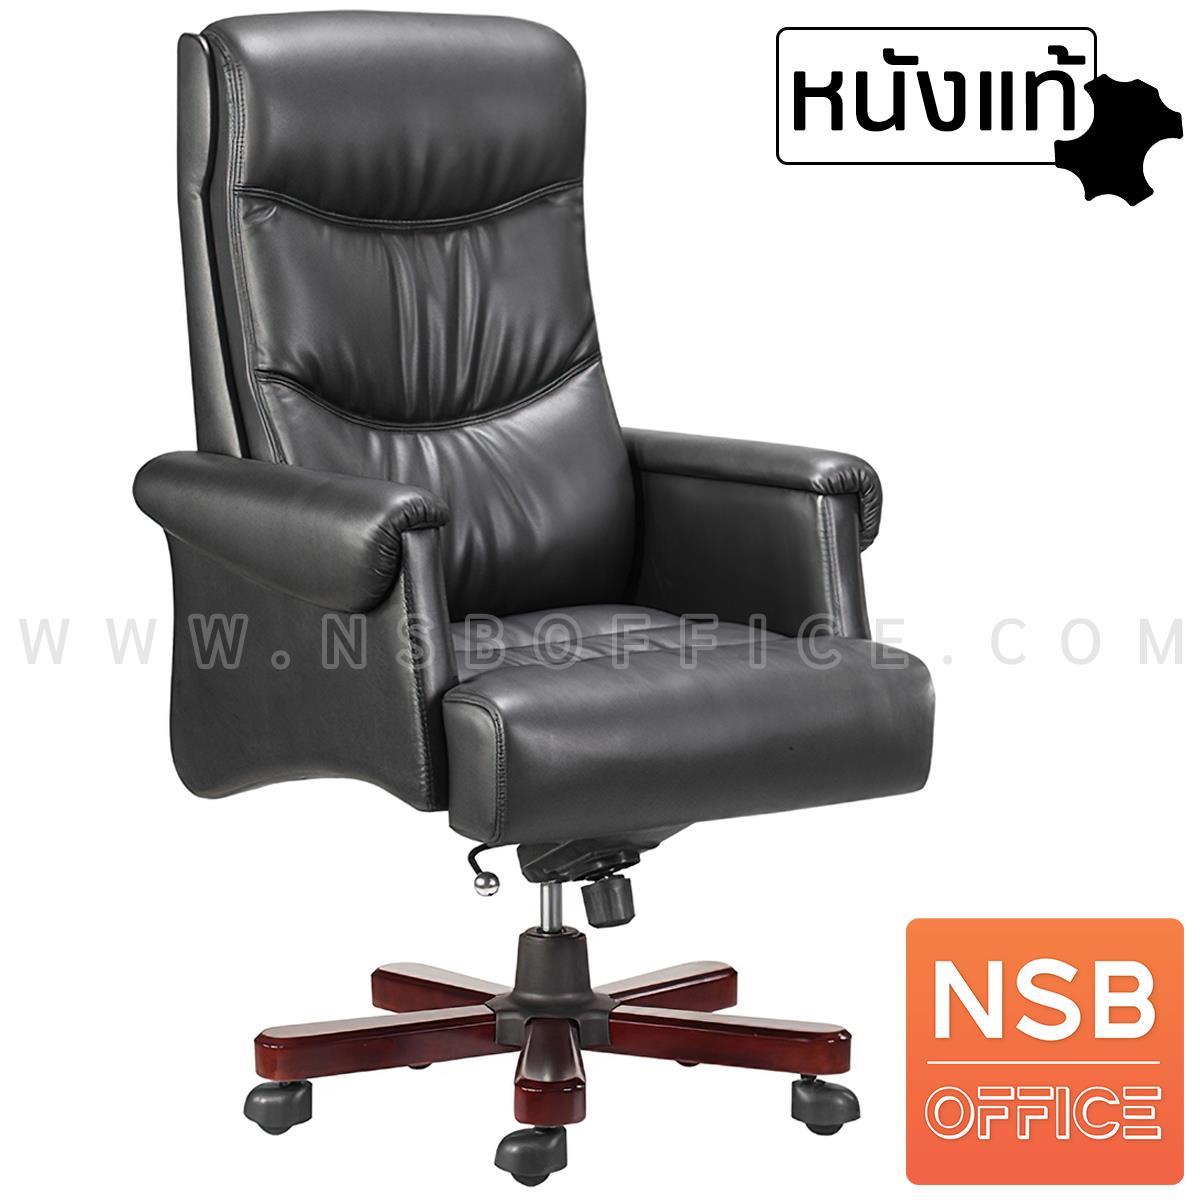 B01A405:เก้าอี้ผู้บริหารหนังแท้ รุ่น Fielder (ฟีลเดอร์)  โช๊คแก๊ส มีก้อนโยก ขาไม้